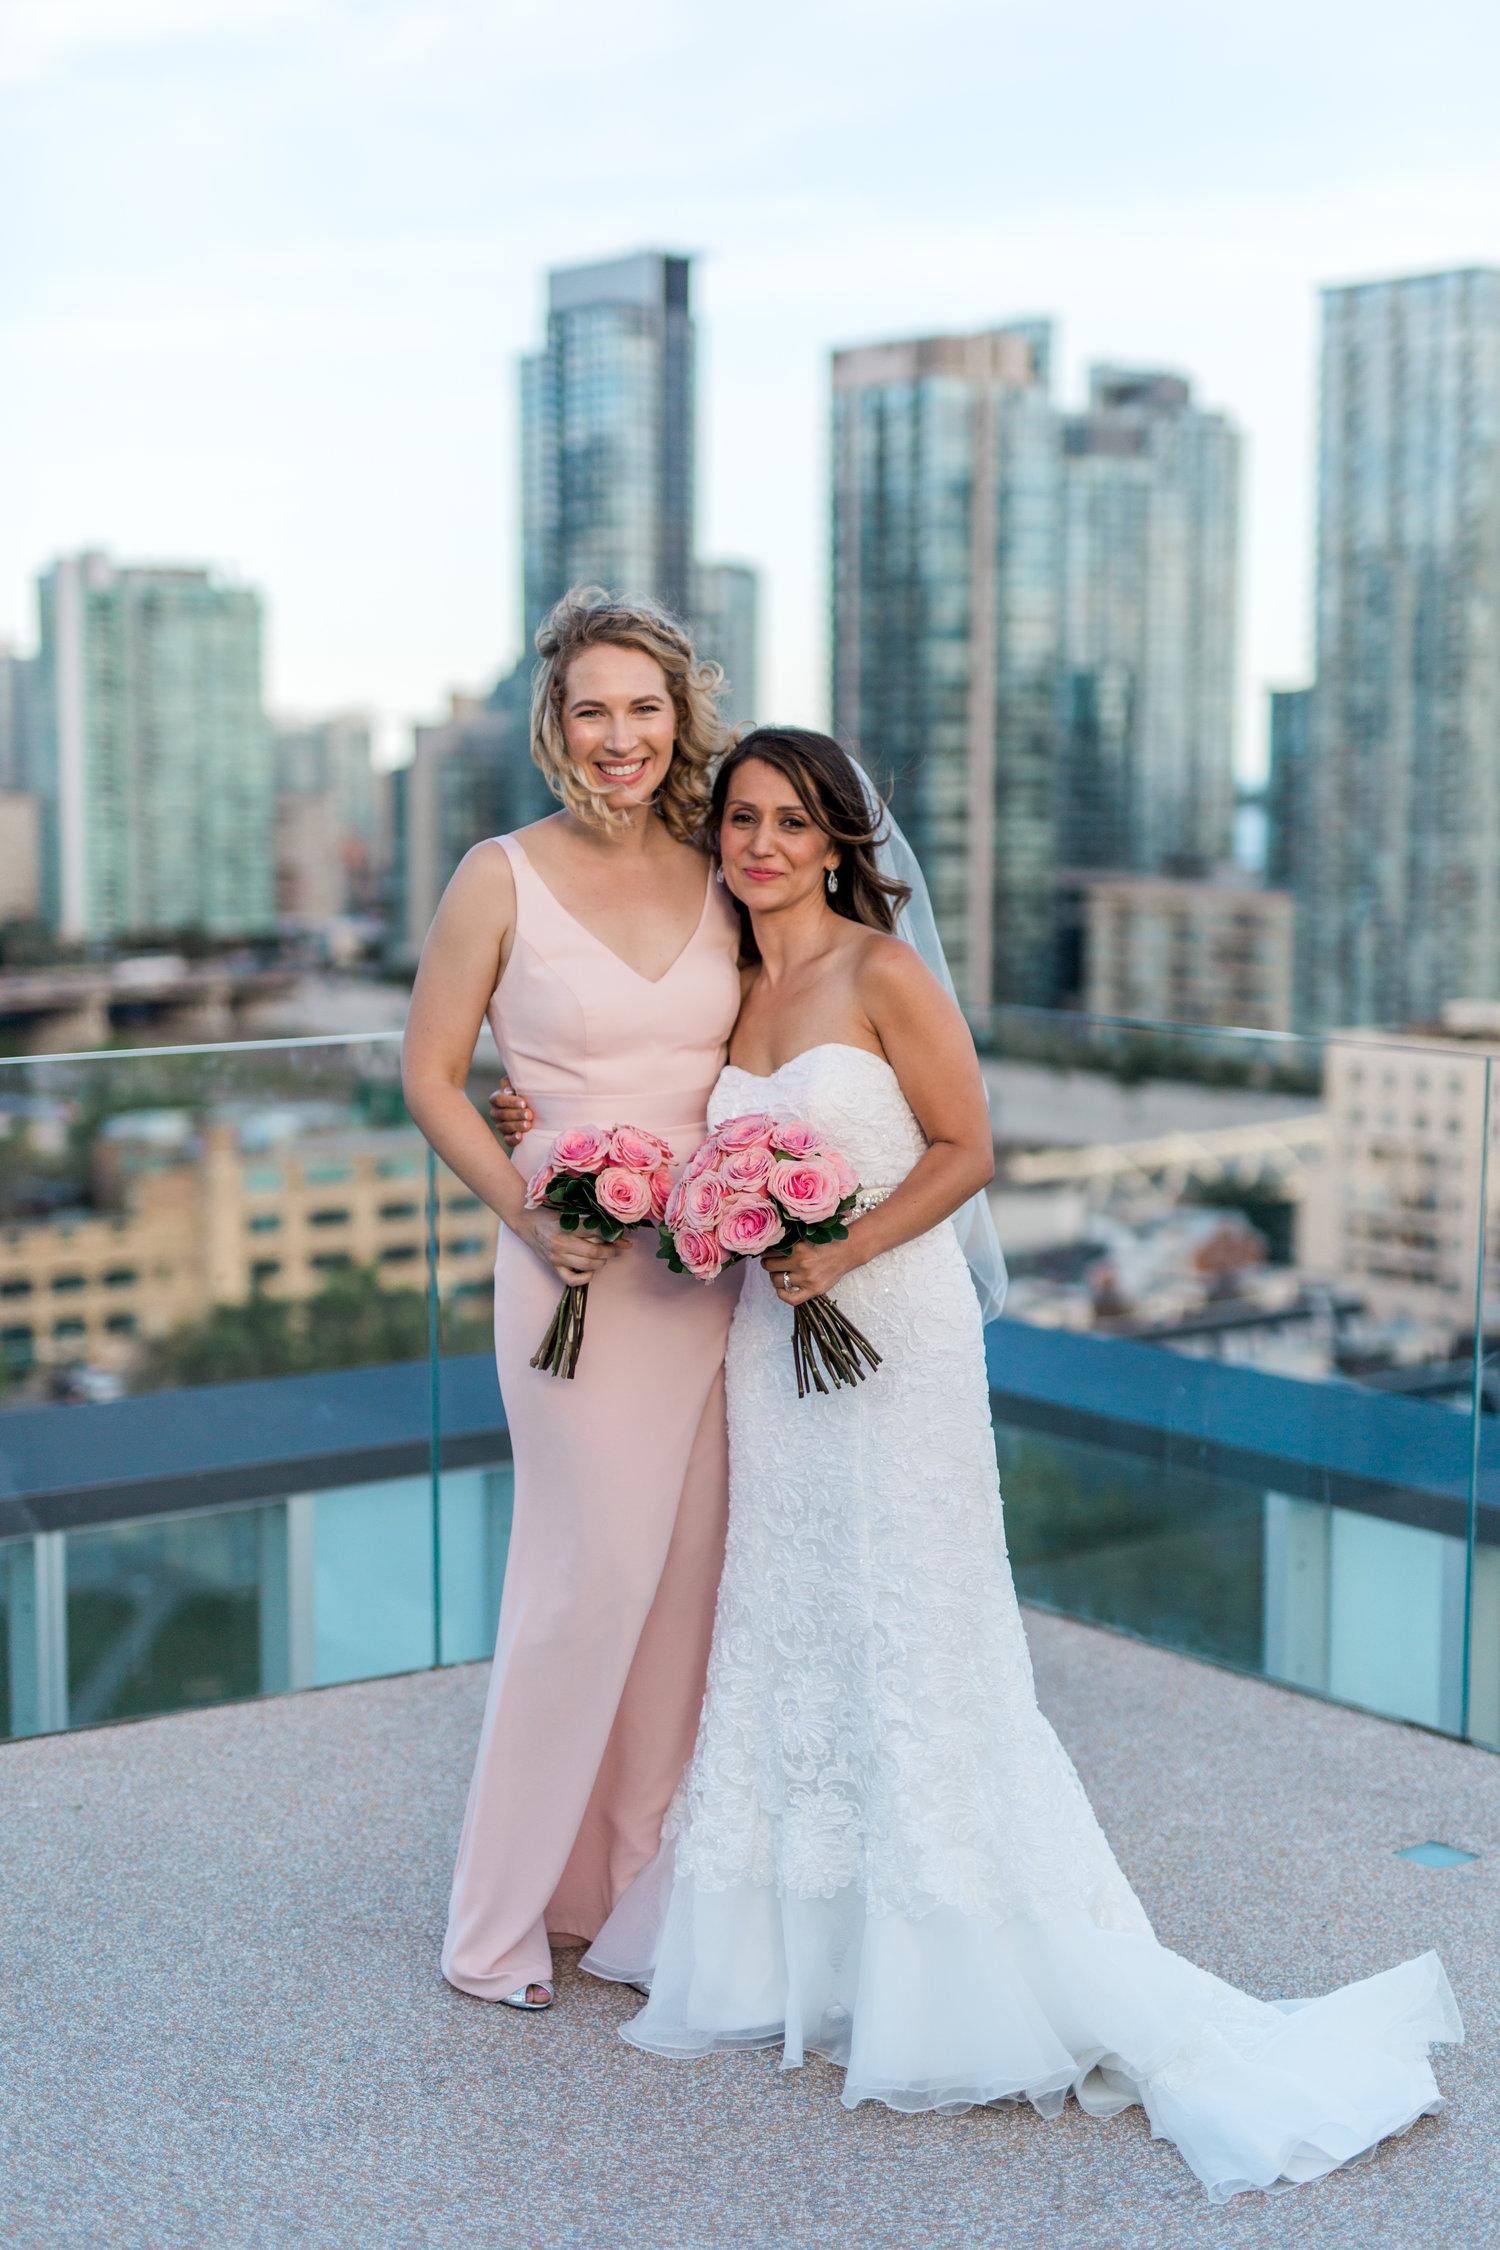 DanielleGiroux_AmirGolbazi_TorontoWeddingPhotographer_ThompsonHotel_SadafWill1860.jpg